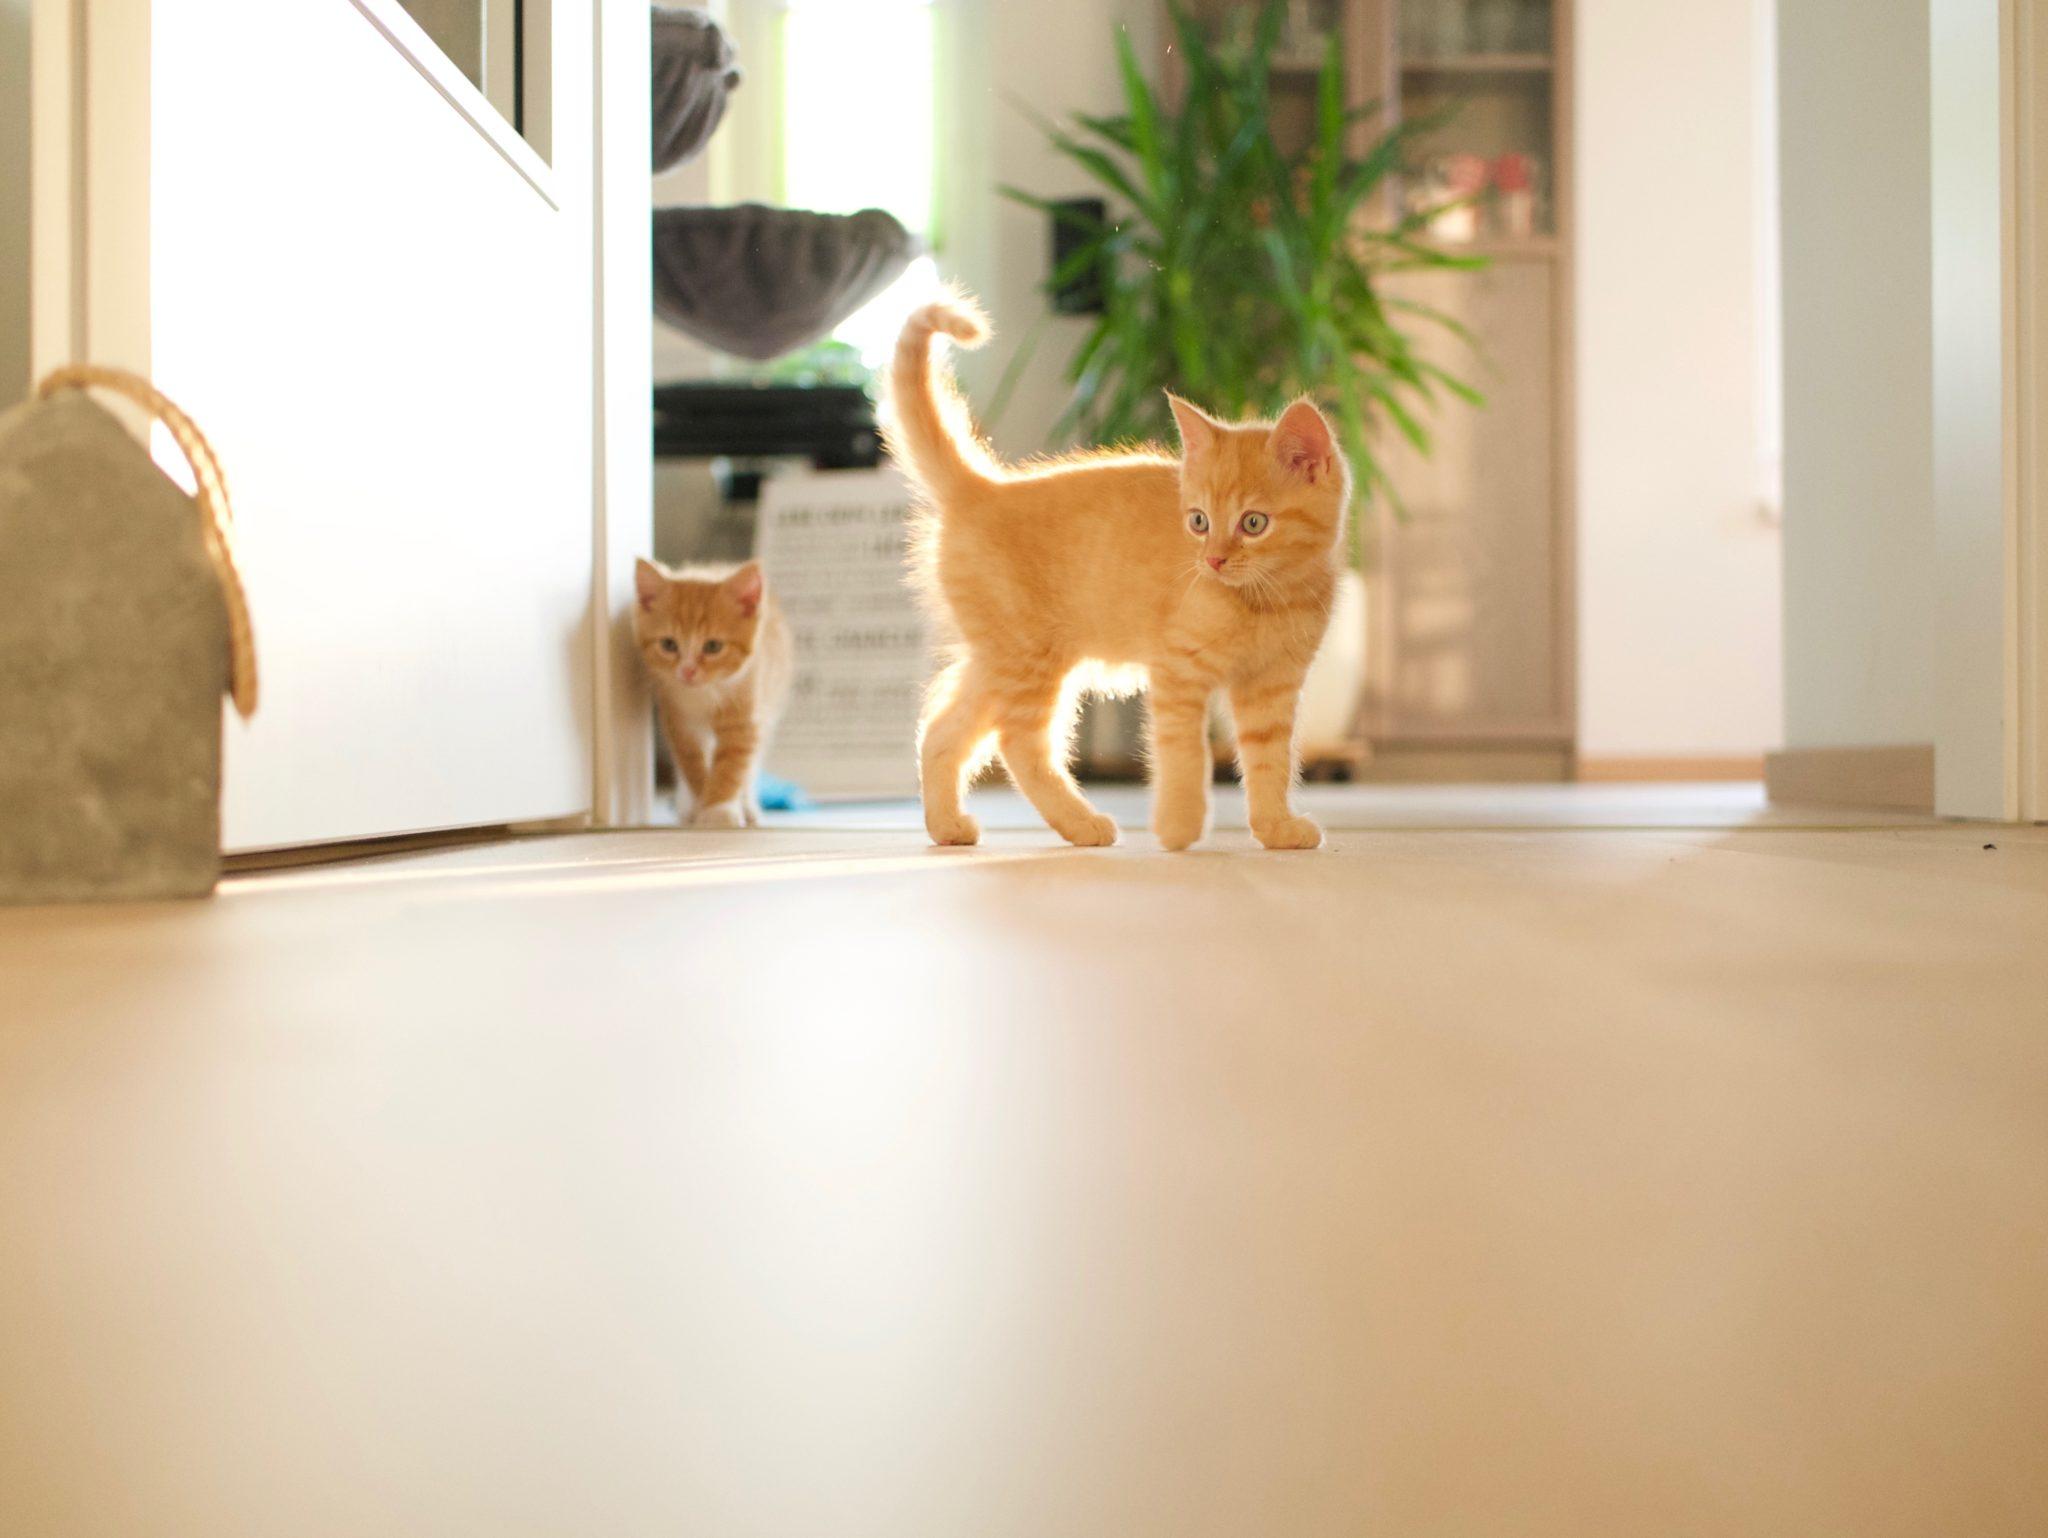 orange tabby kittens playing in hallway